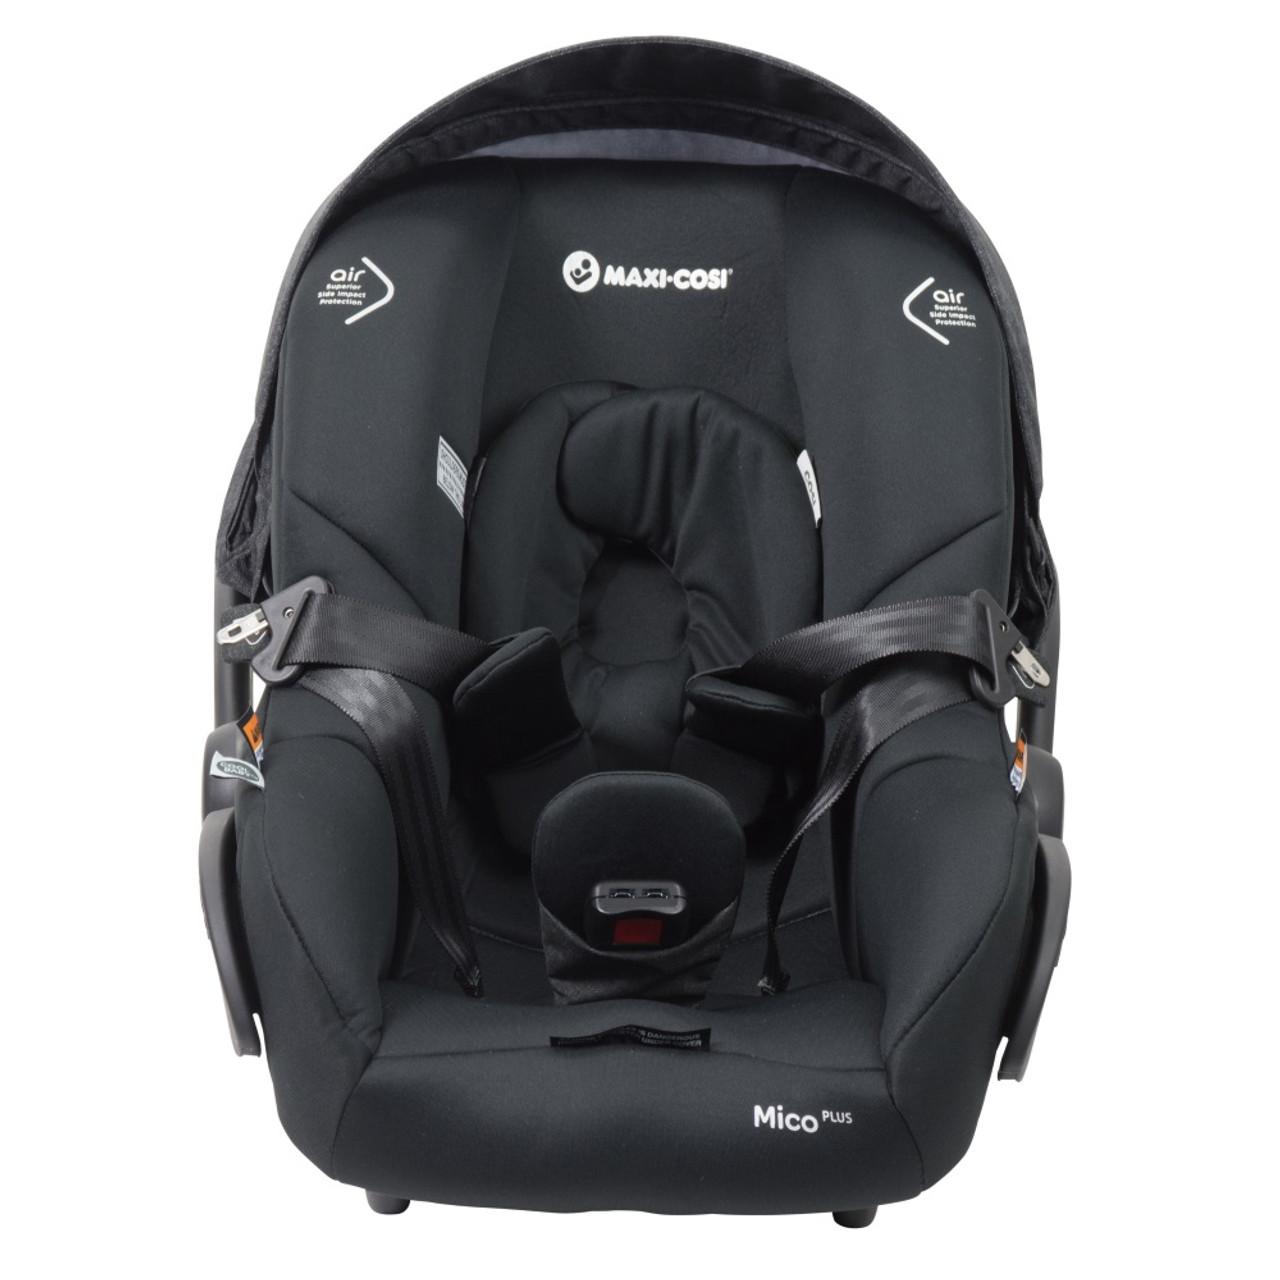 Maxi Cosi Mico Plus Infant Carrier ISOFIX